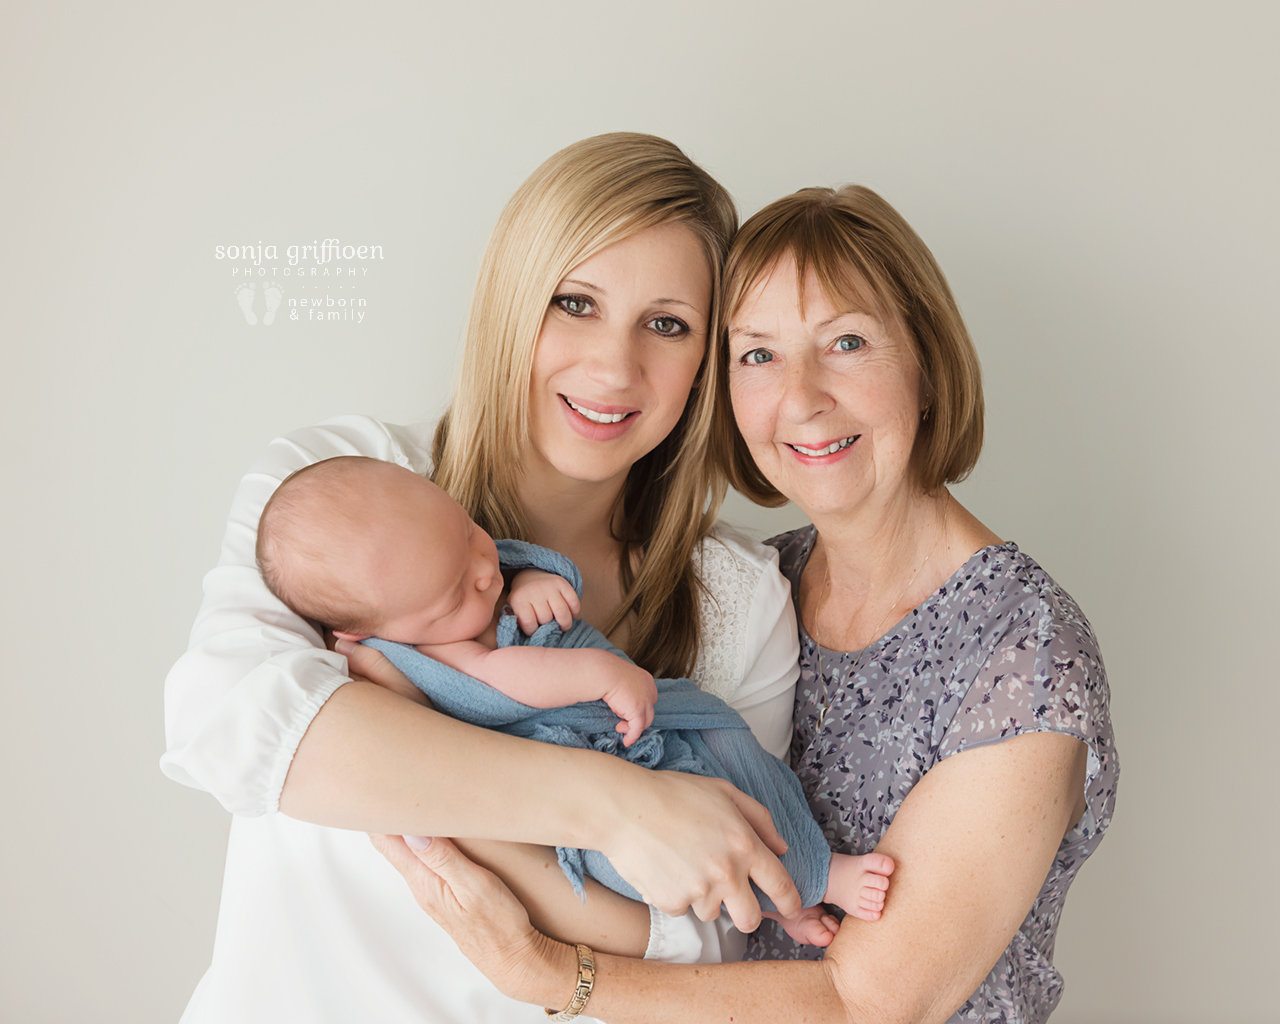 Joshua-Newborn-Brisbane-Newborn-Photographer-Sonja-Griffioen-14.jpg